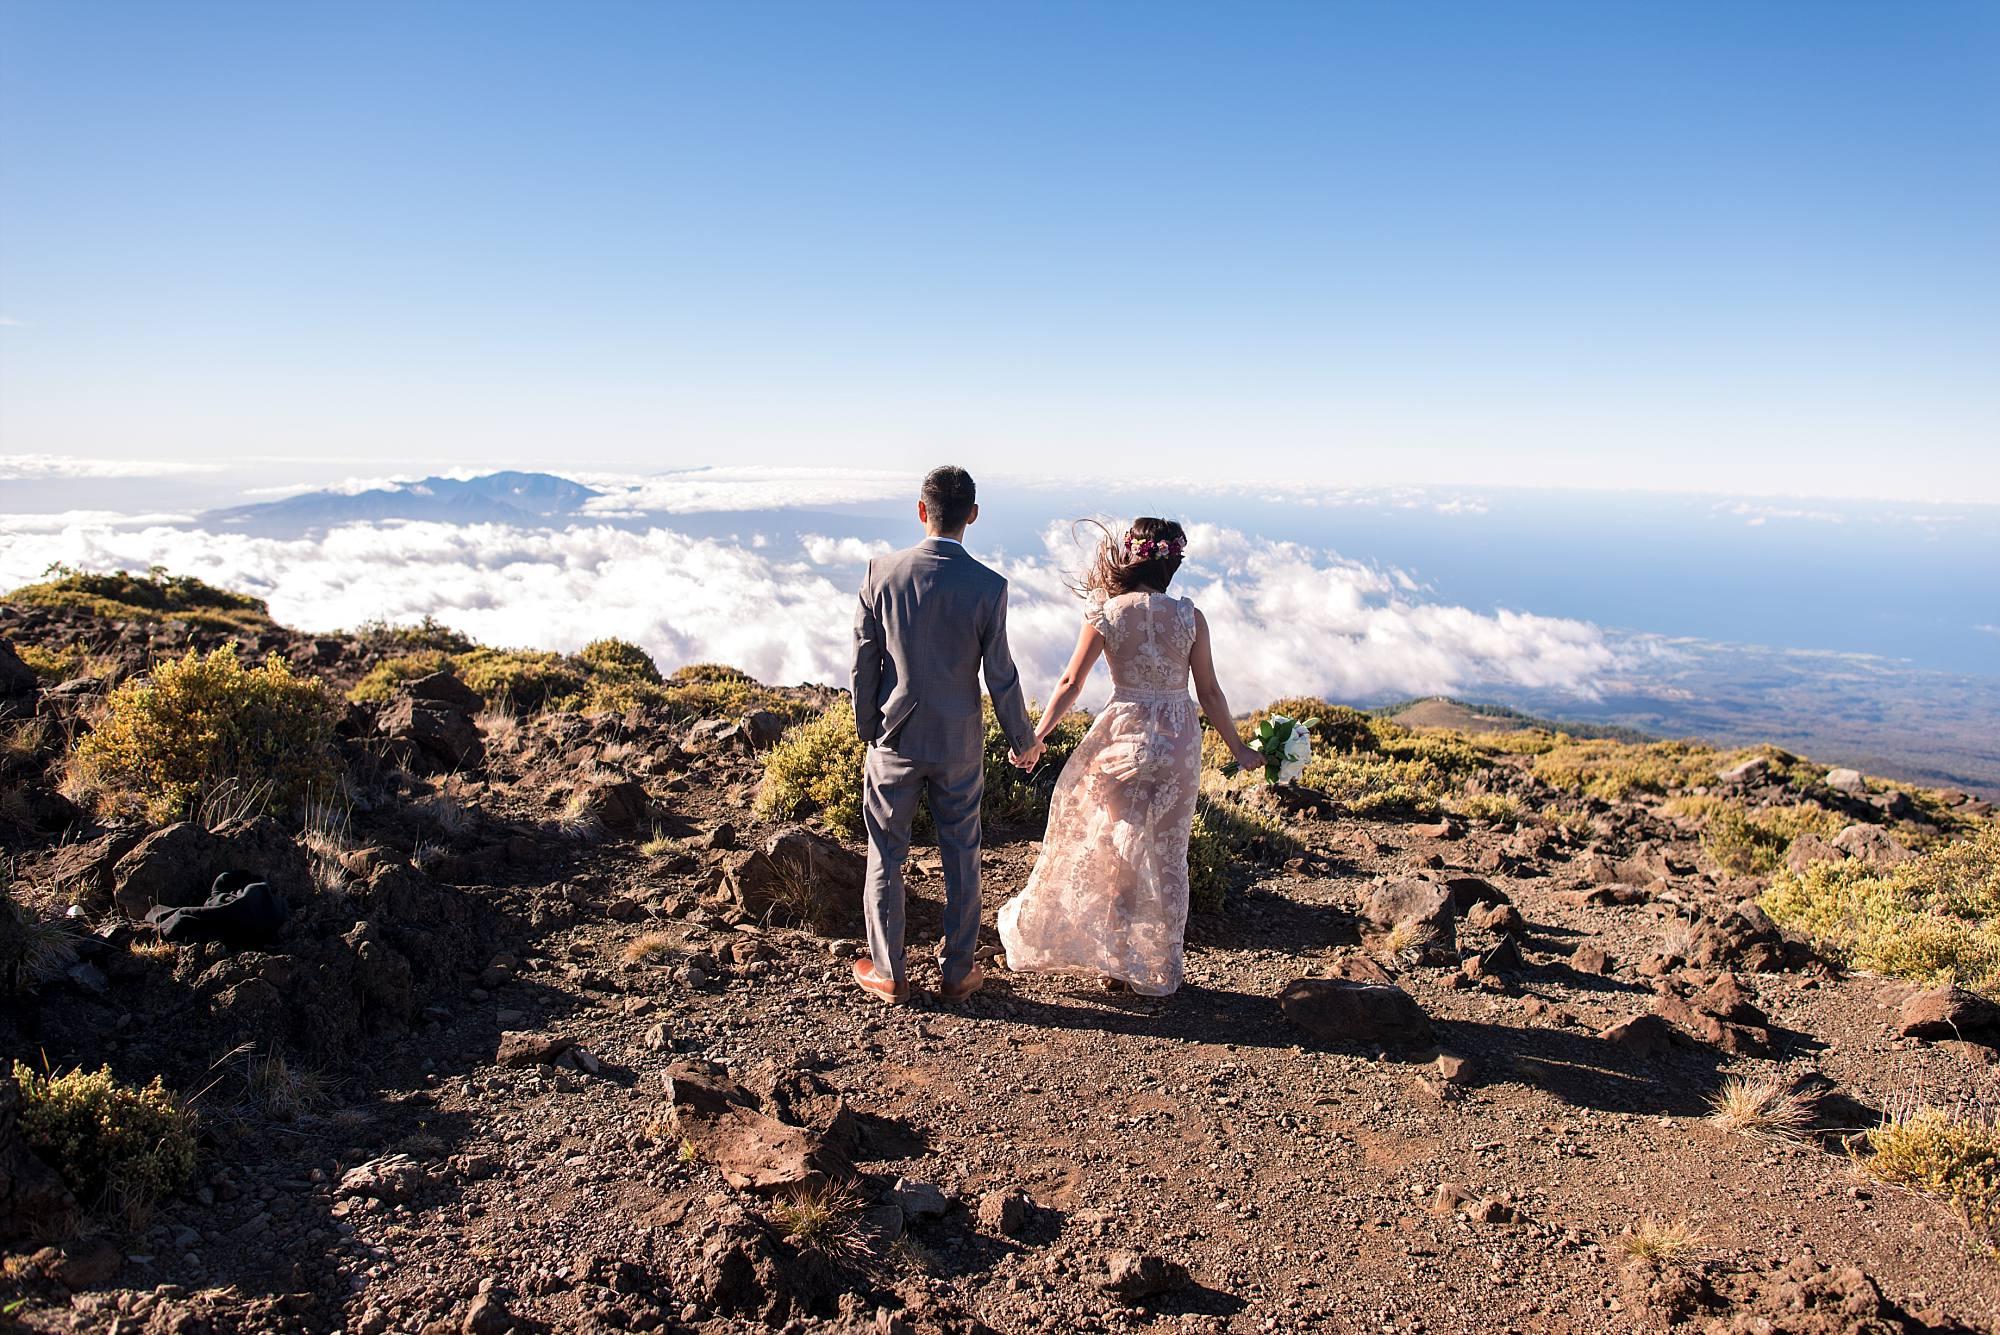 wedding couple holding hands, backs to camera